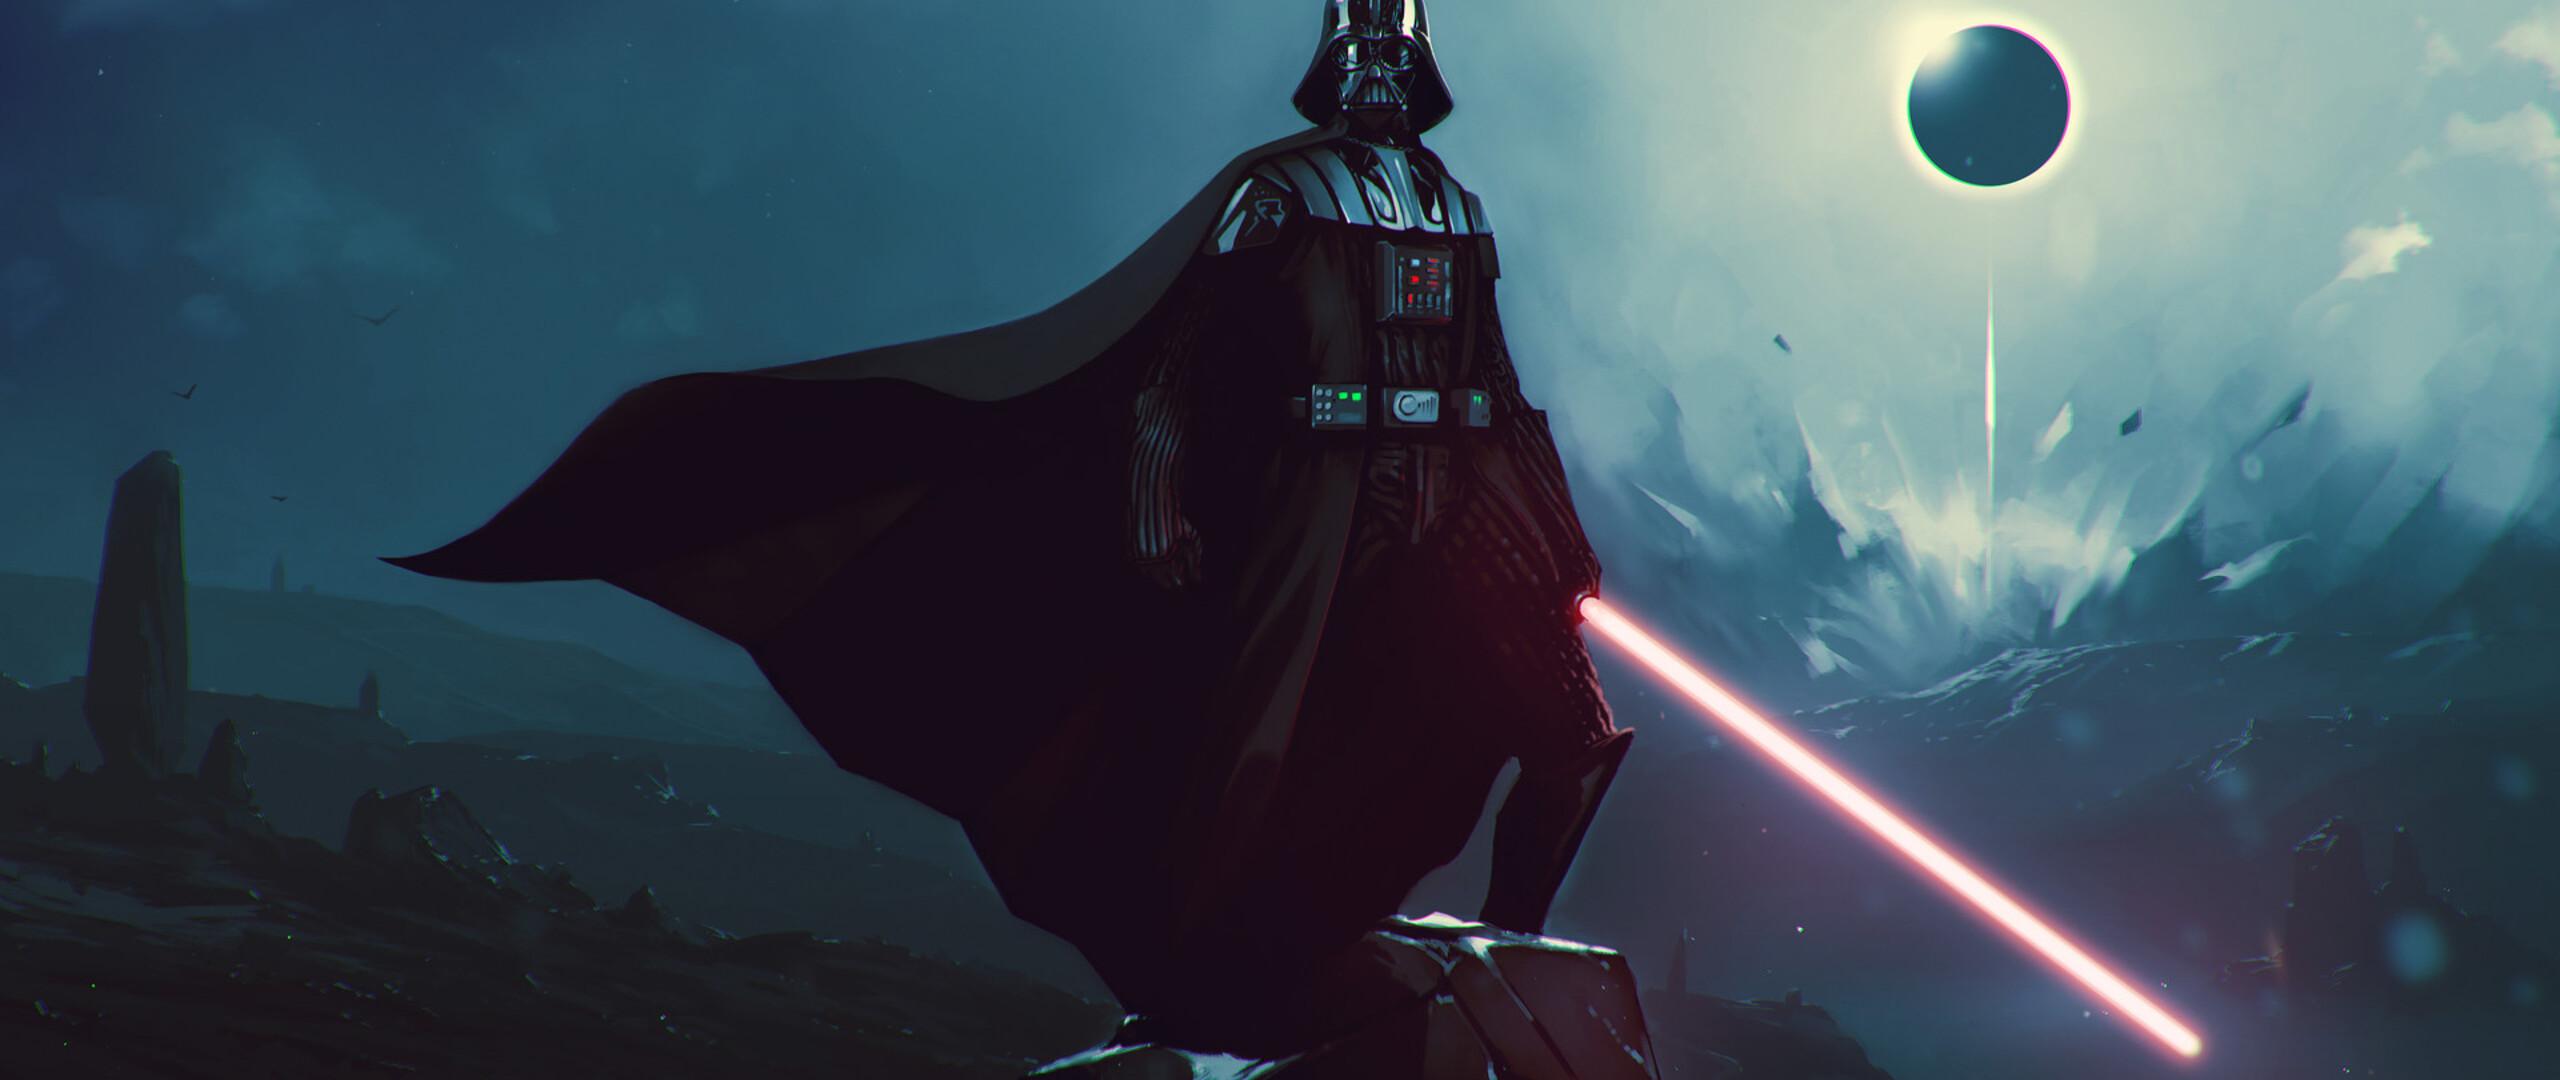 Photo Collection 2560X1080 Wallpaper Darth Vader